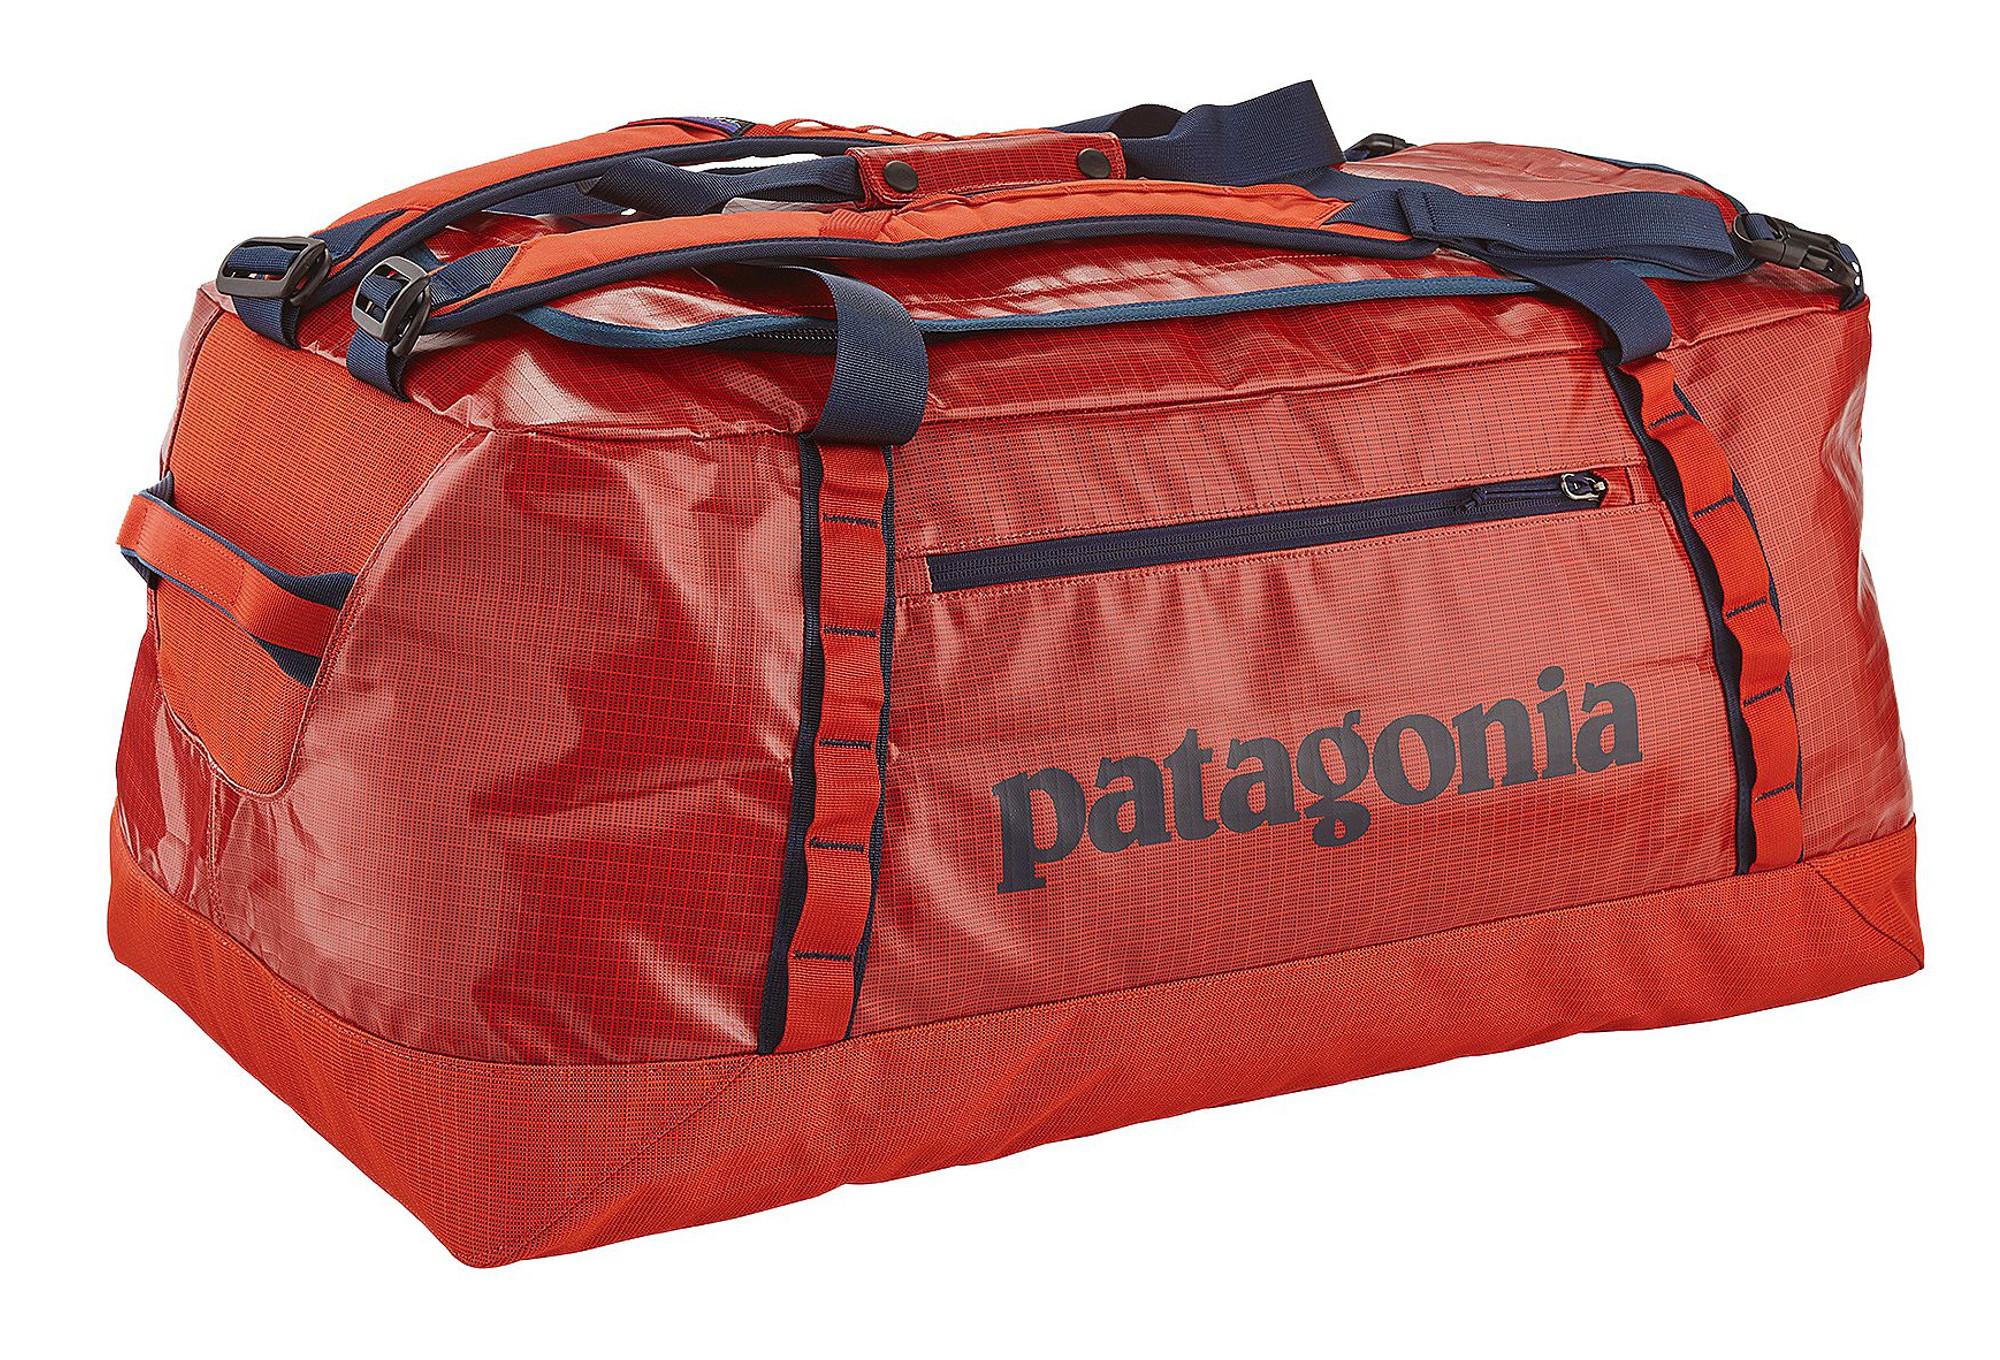 grand choix de 3db87 50032 Sac de Voyages Patagonia Black Hole Red